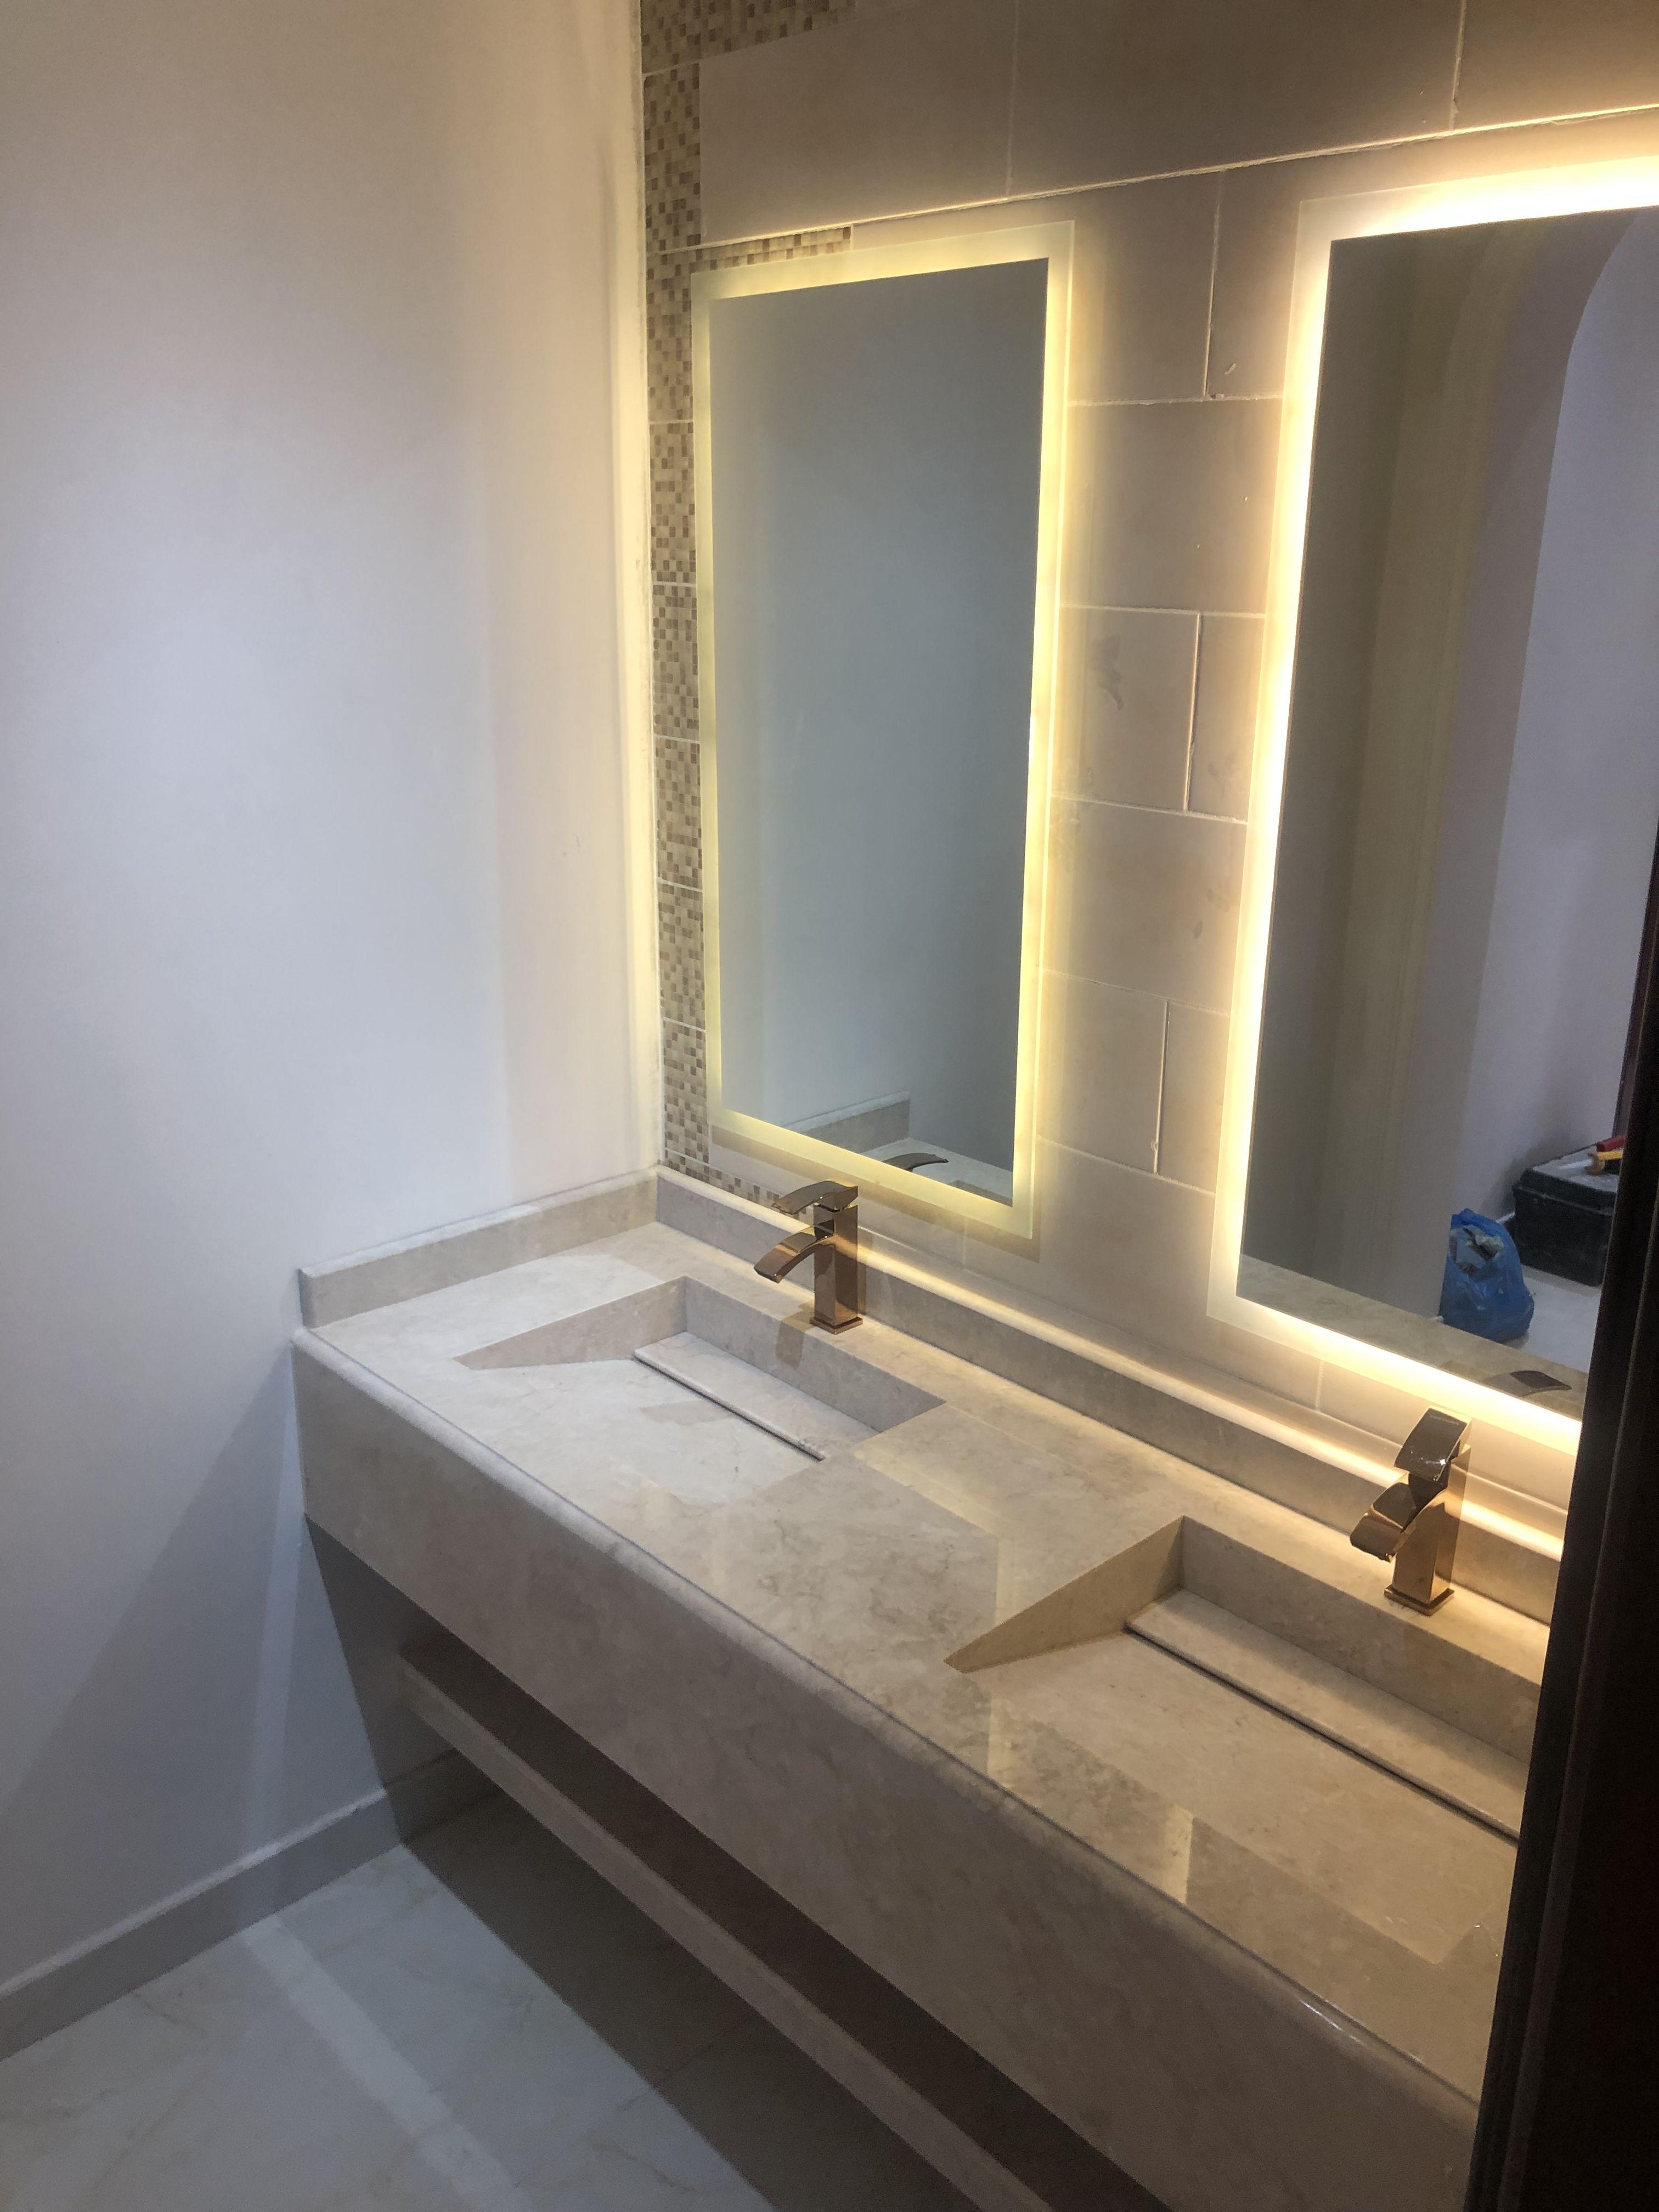 Pin By Shog Aa On أعمال فنية Bathroom Design Decor Modern Bedroom Design Home Decor Furniture